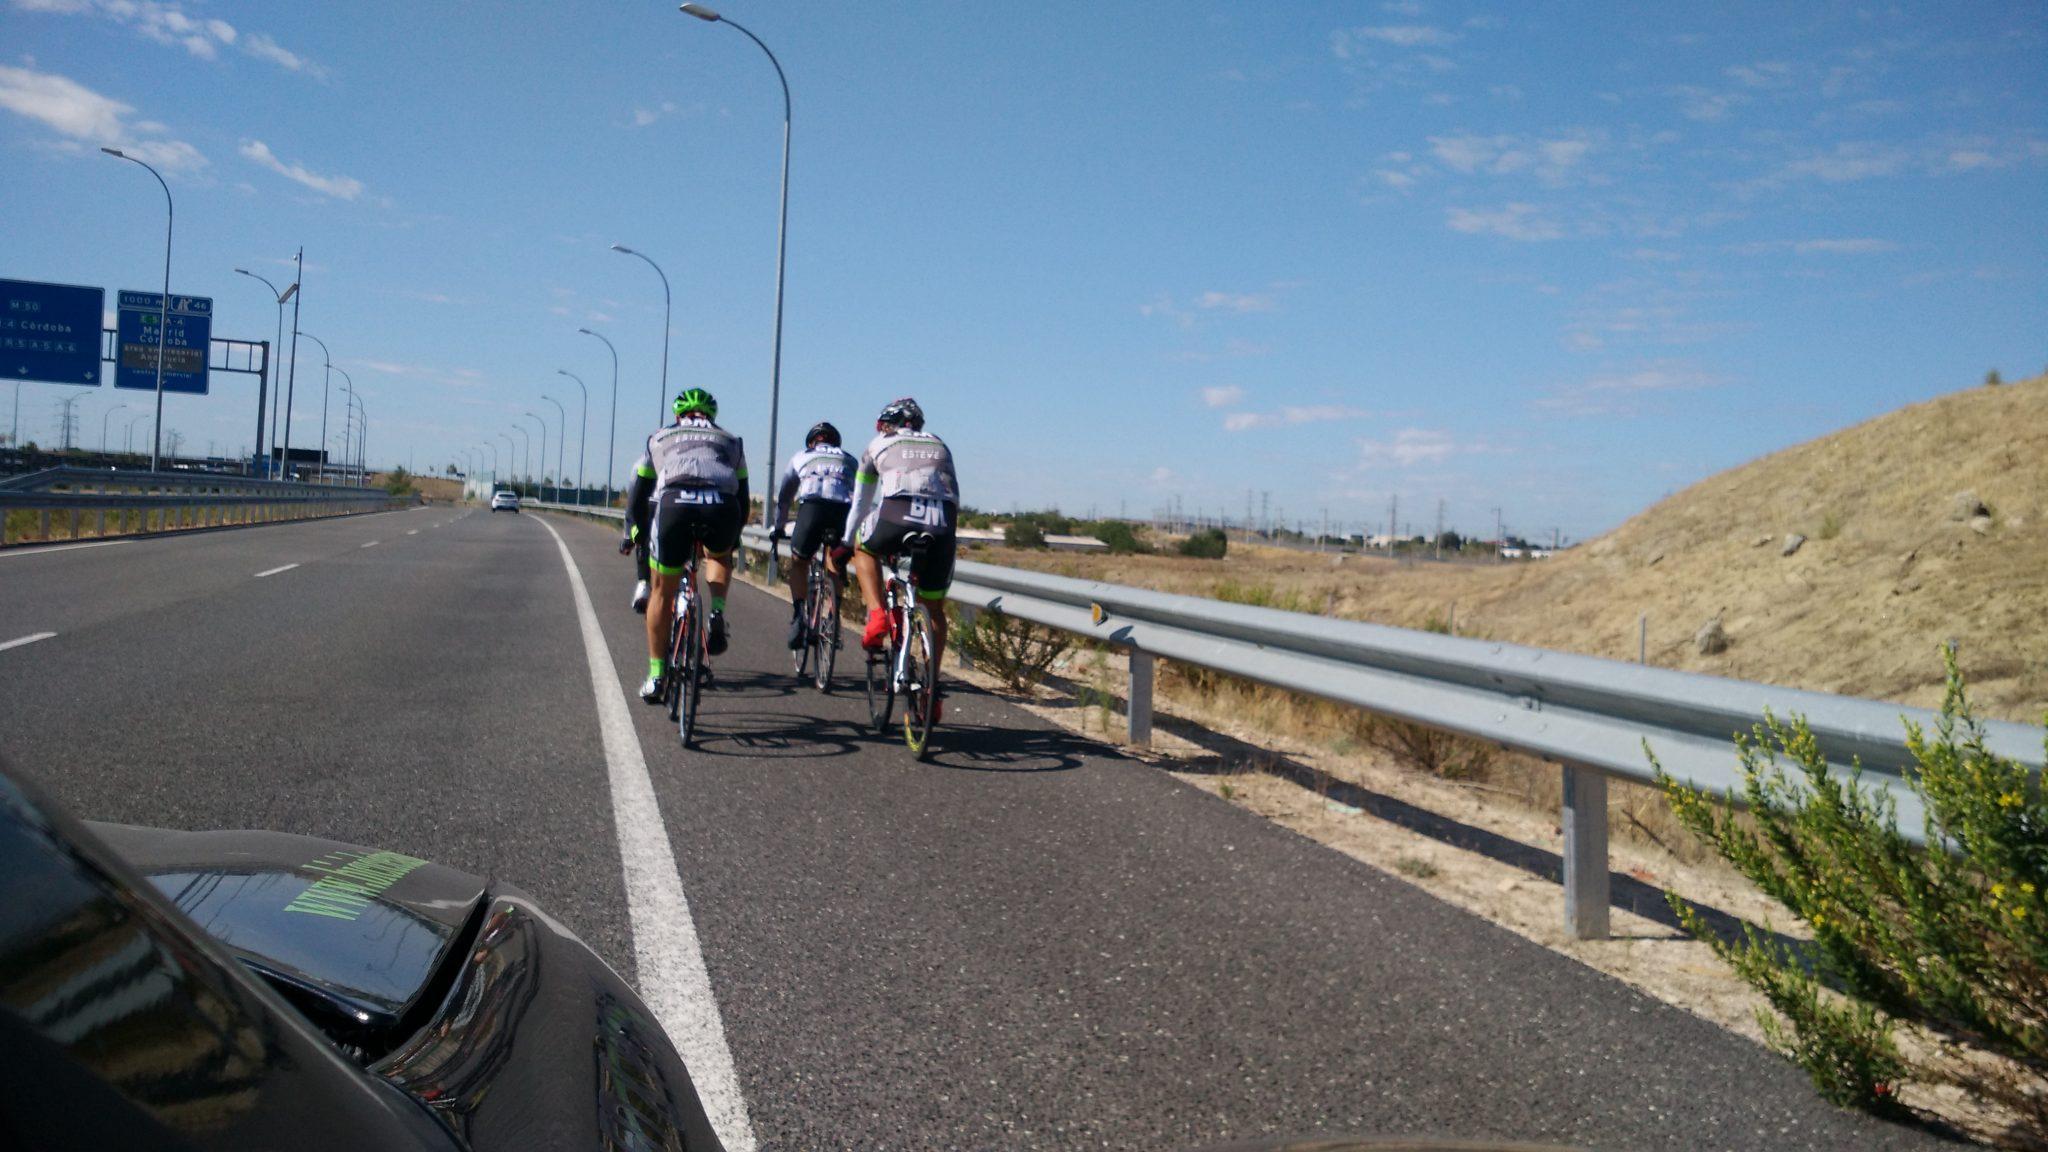 Grupeta_BM_Salida_Morata_Tajuña_16092017_5_Biciletas Mañas BM-Tienda-de-venta-y-reparacion-de-bicicletas-Ridley-Madrid